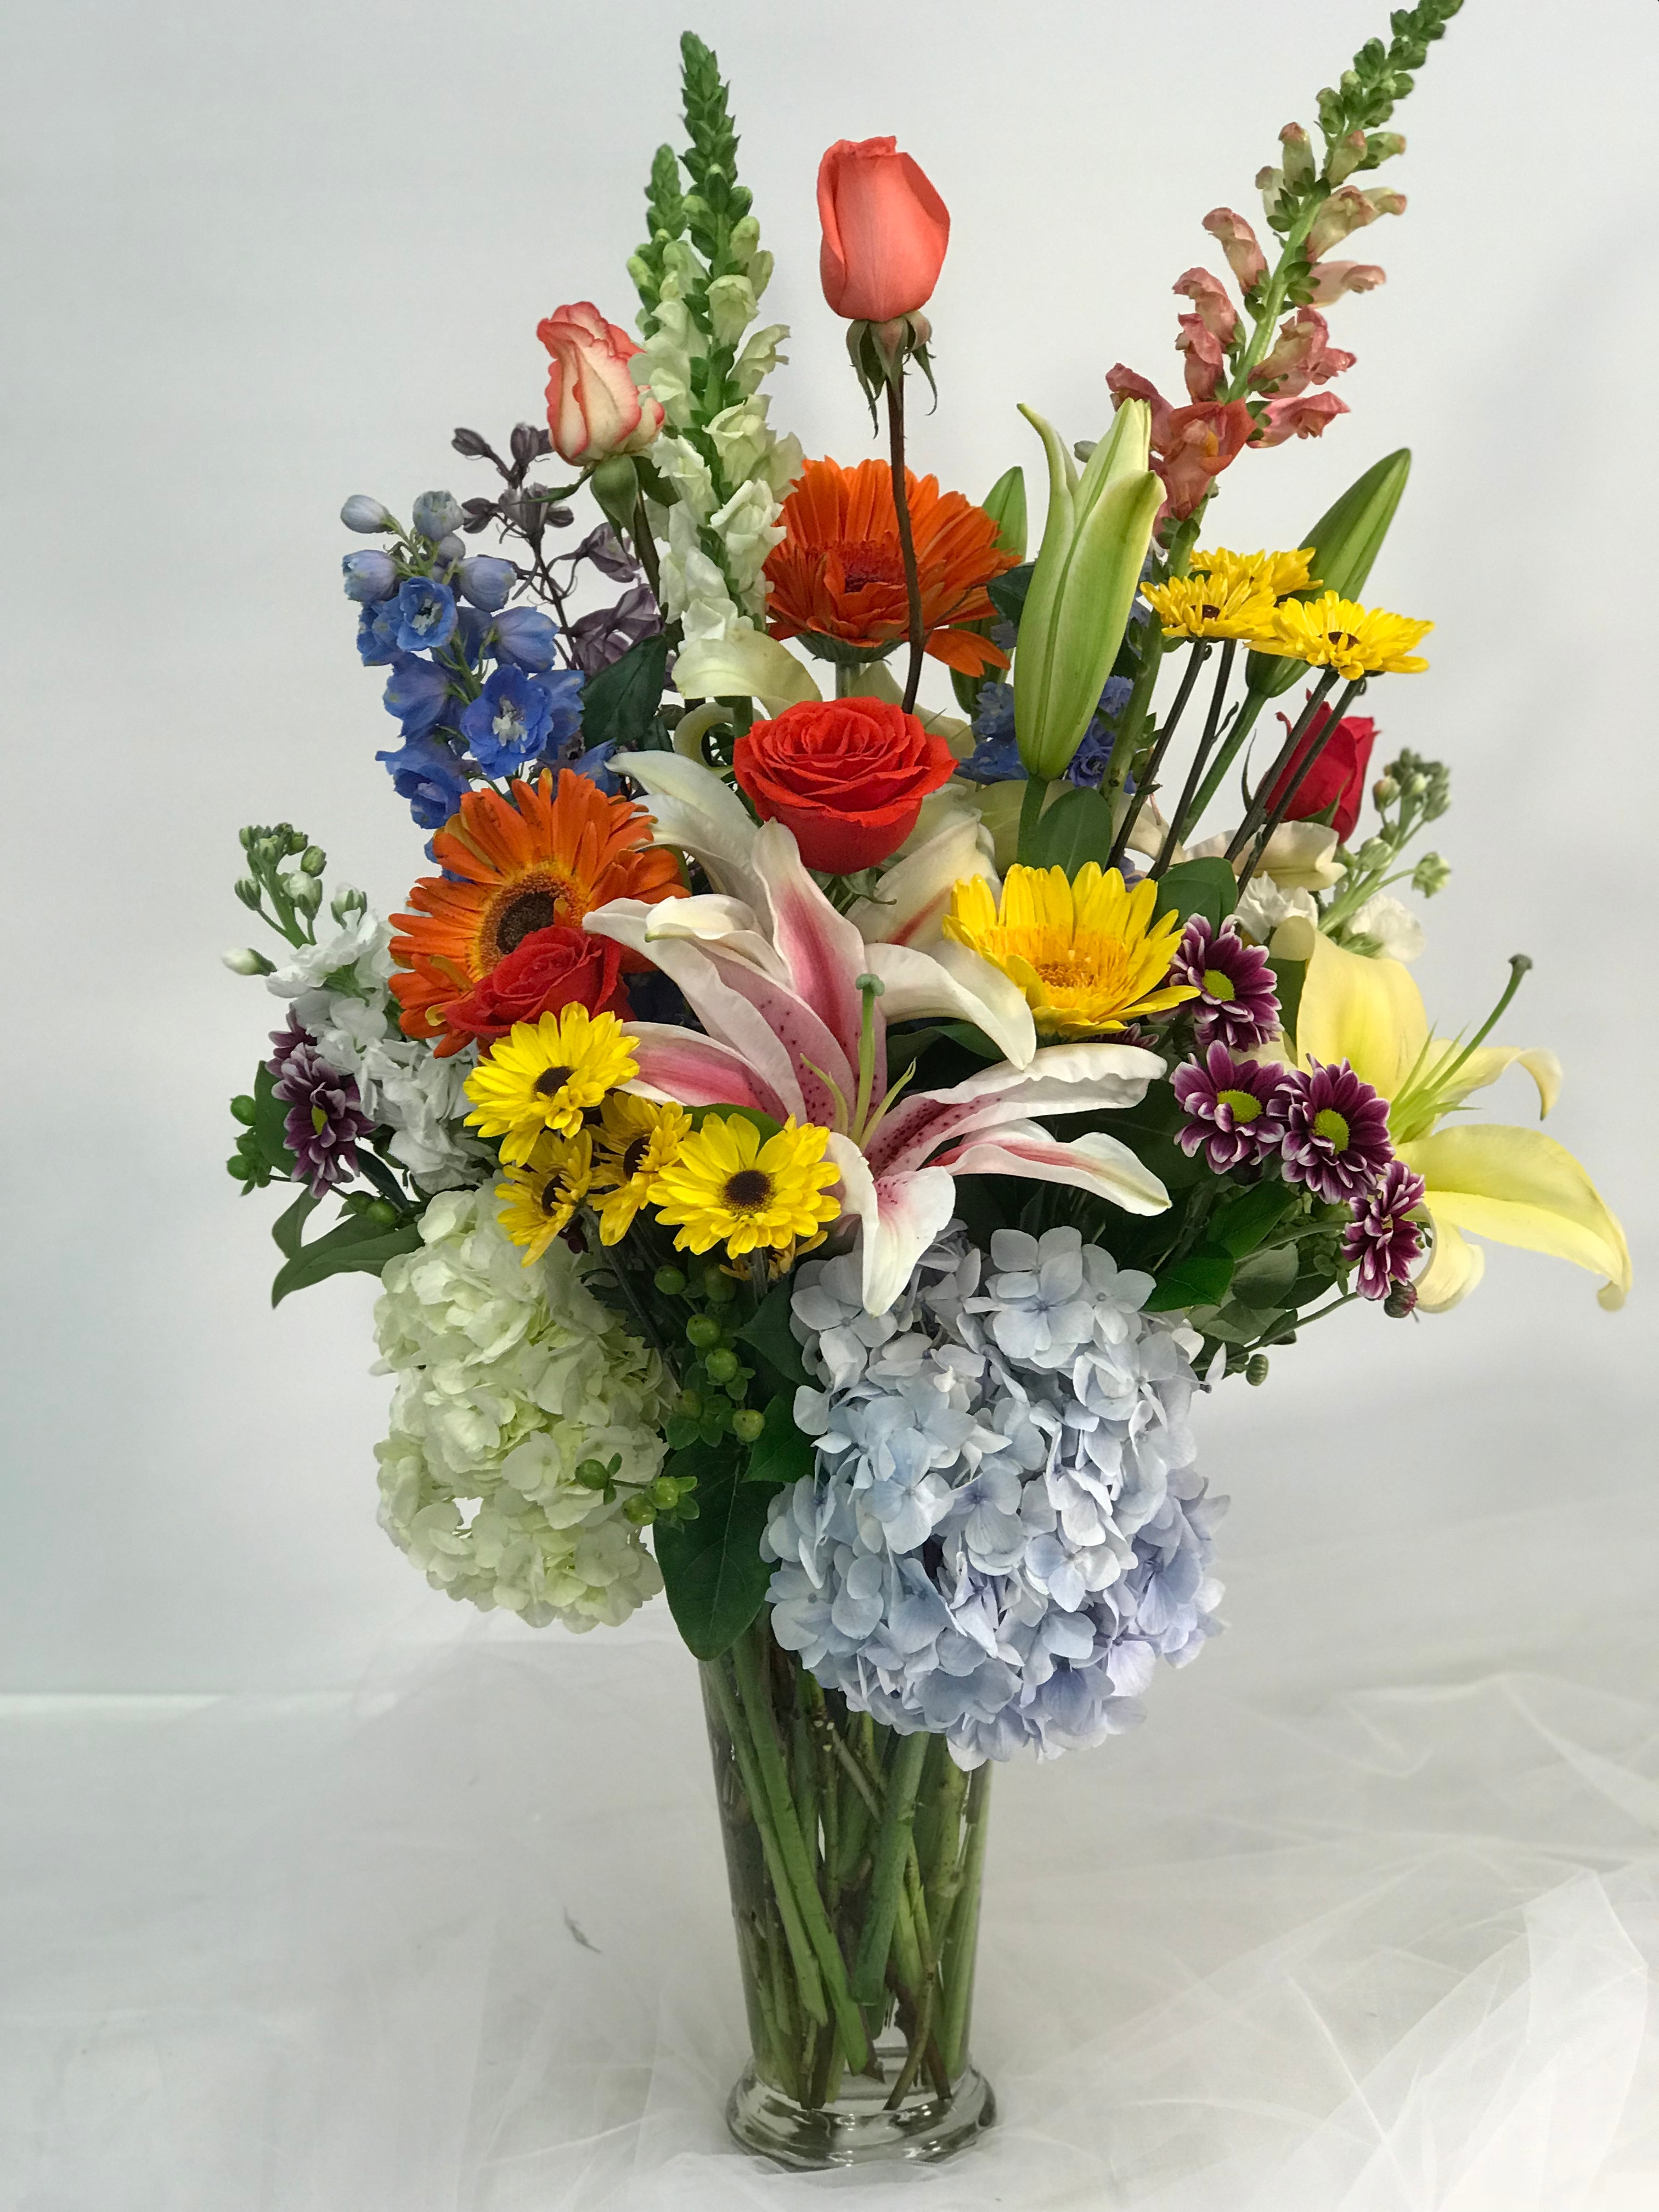 Naples Florist Flower Delivery By Genes 5th Ave Florist